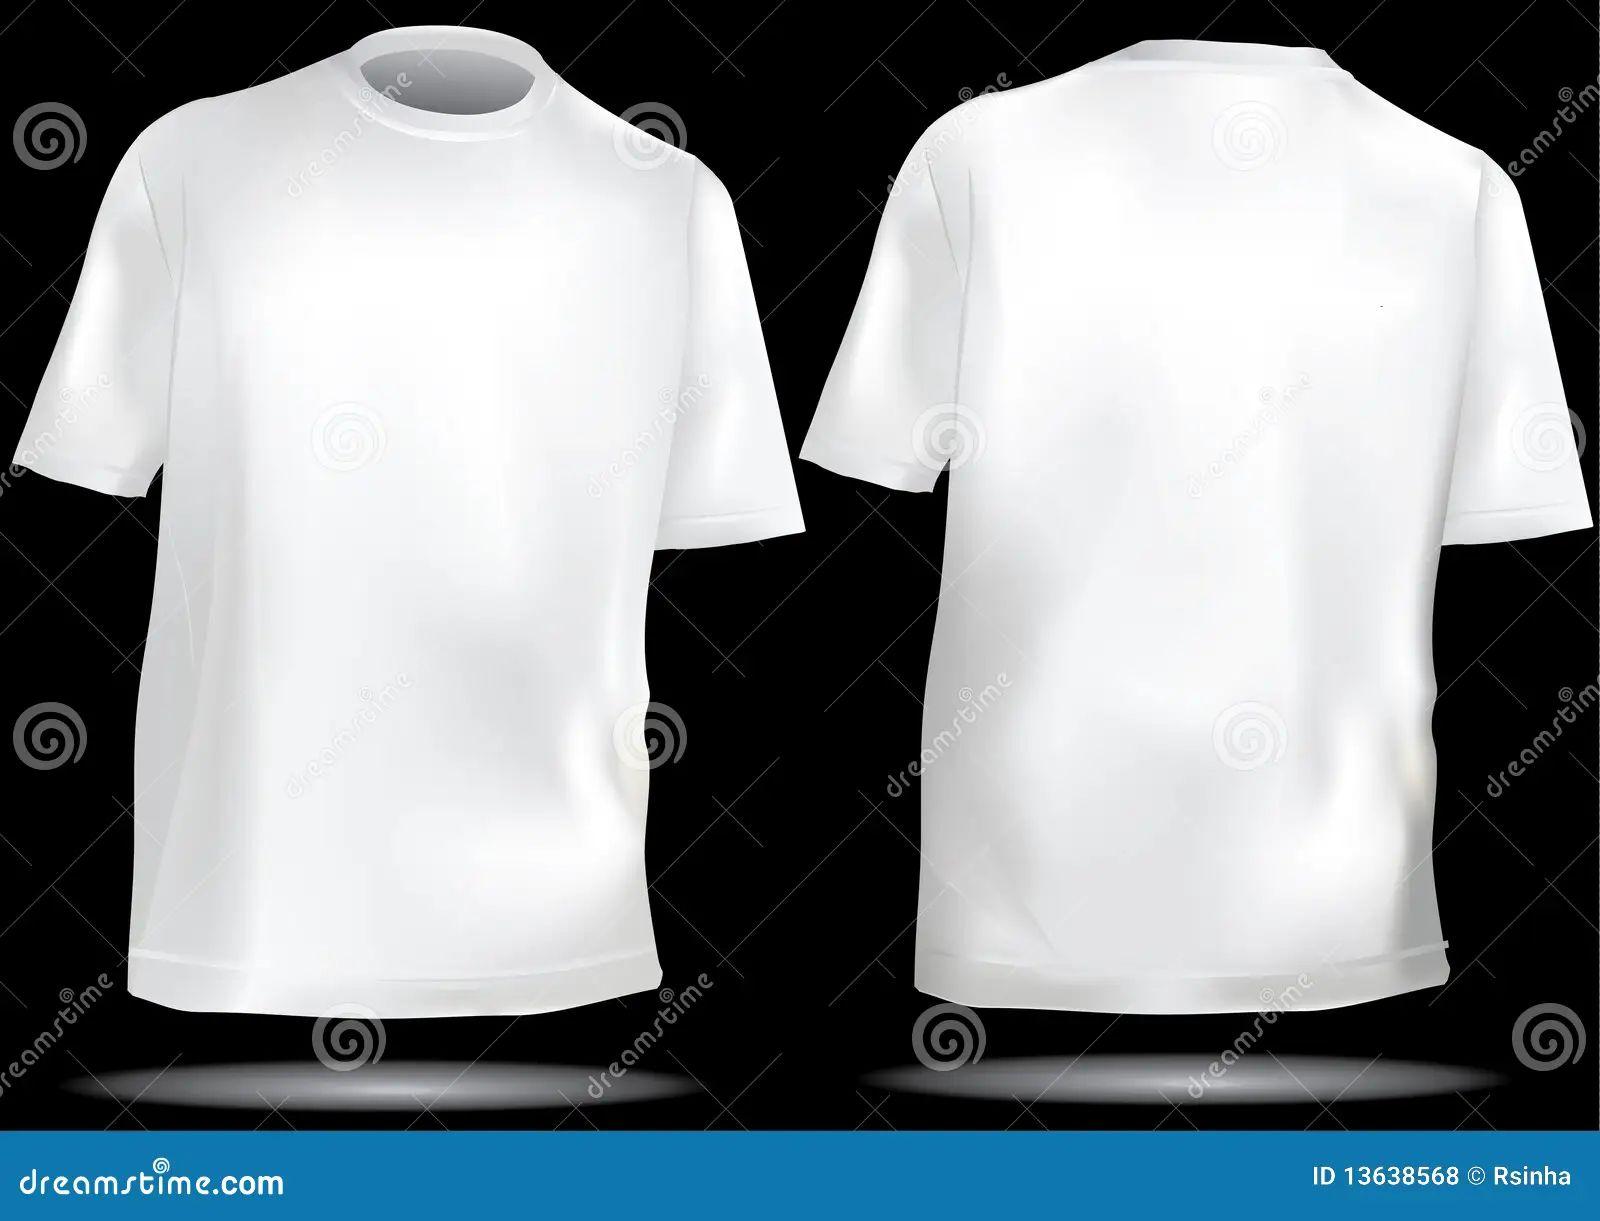 Black t shirt plain front and back - Black T Shirt Plain Template Blank Black T Shirt Template T Shirt Template With Front